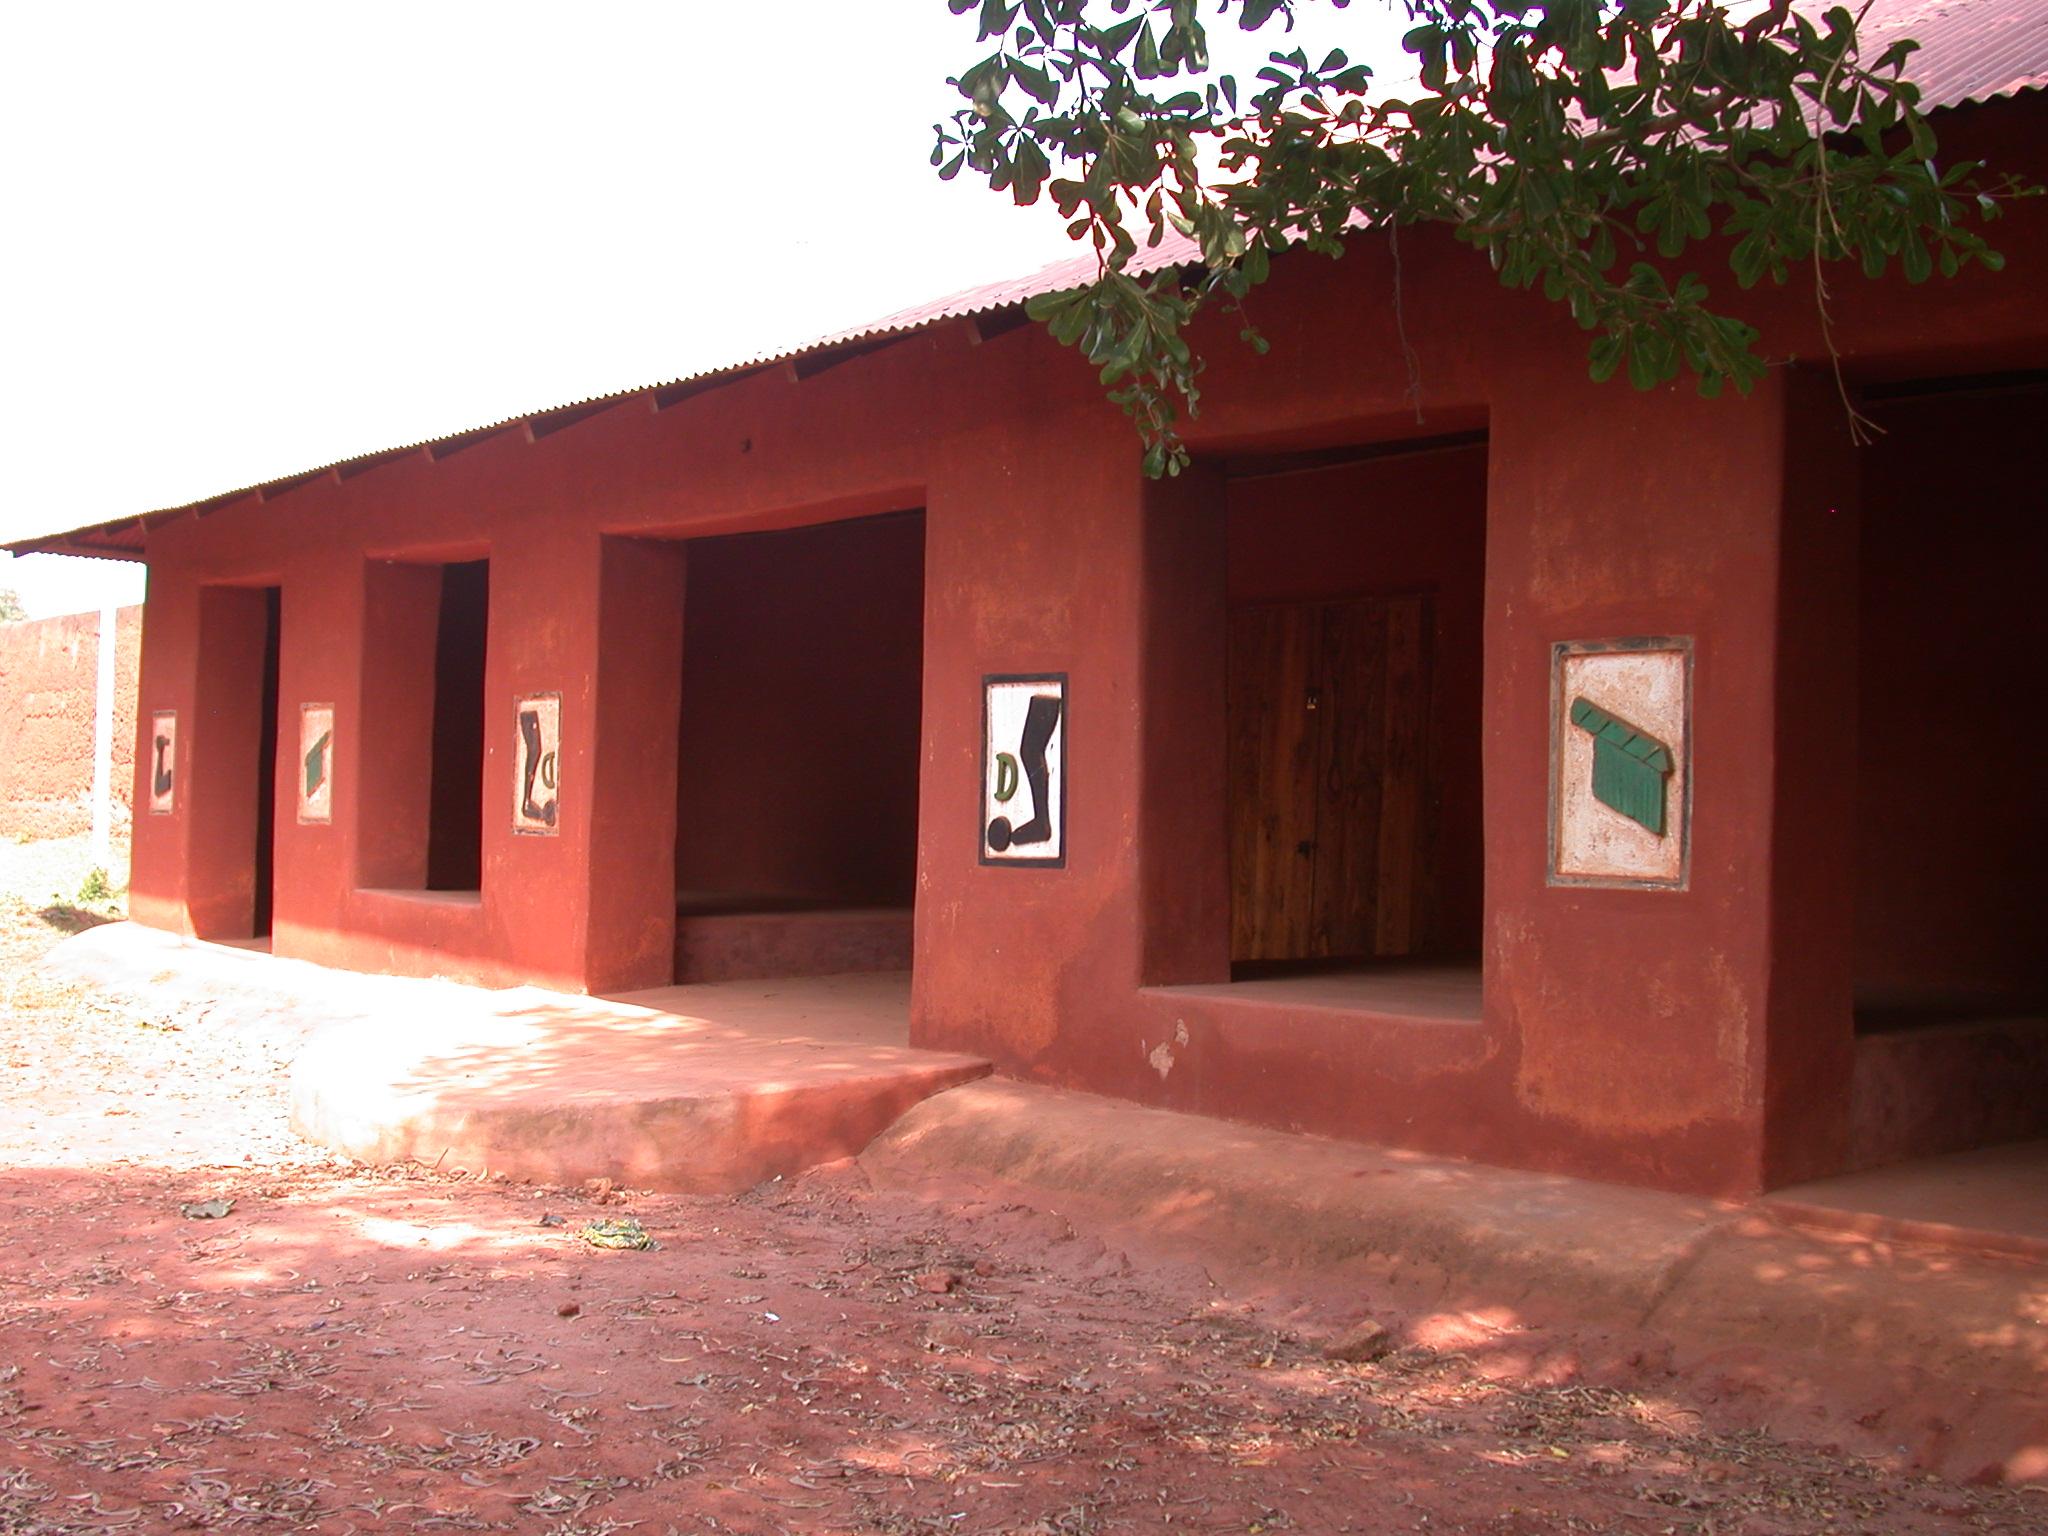 Palace of King Agoli-Agbo, Abomey, Benin